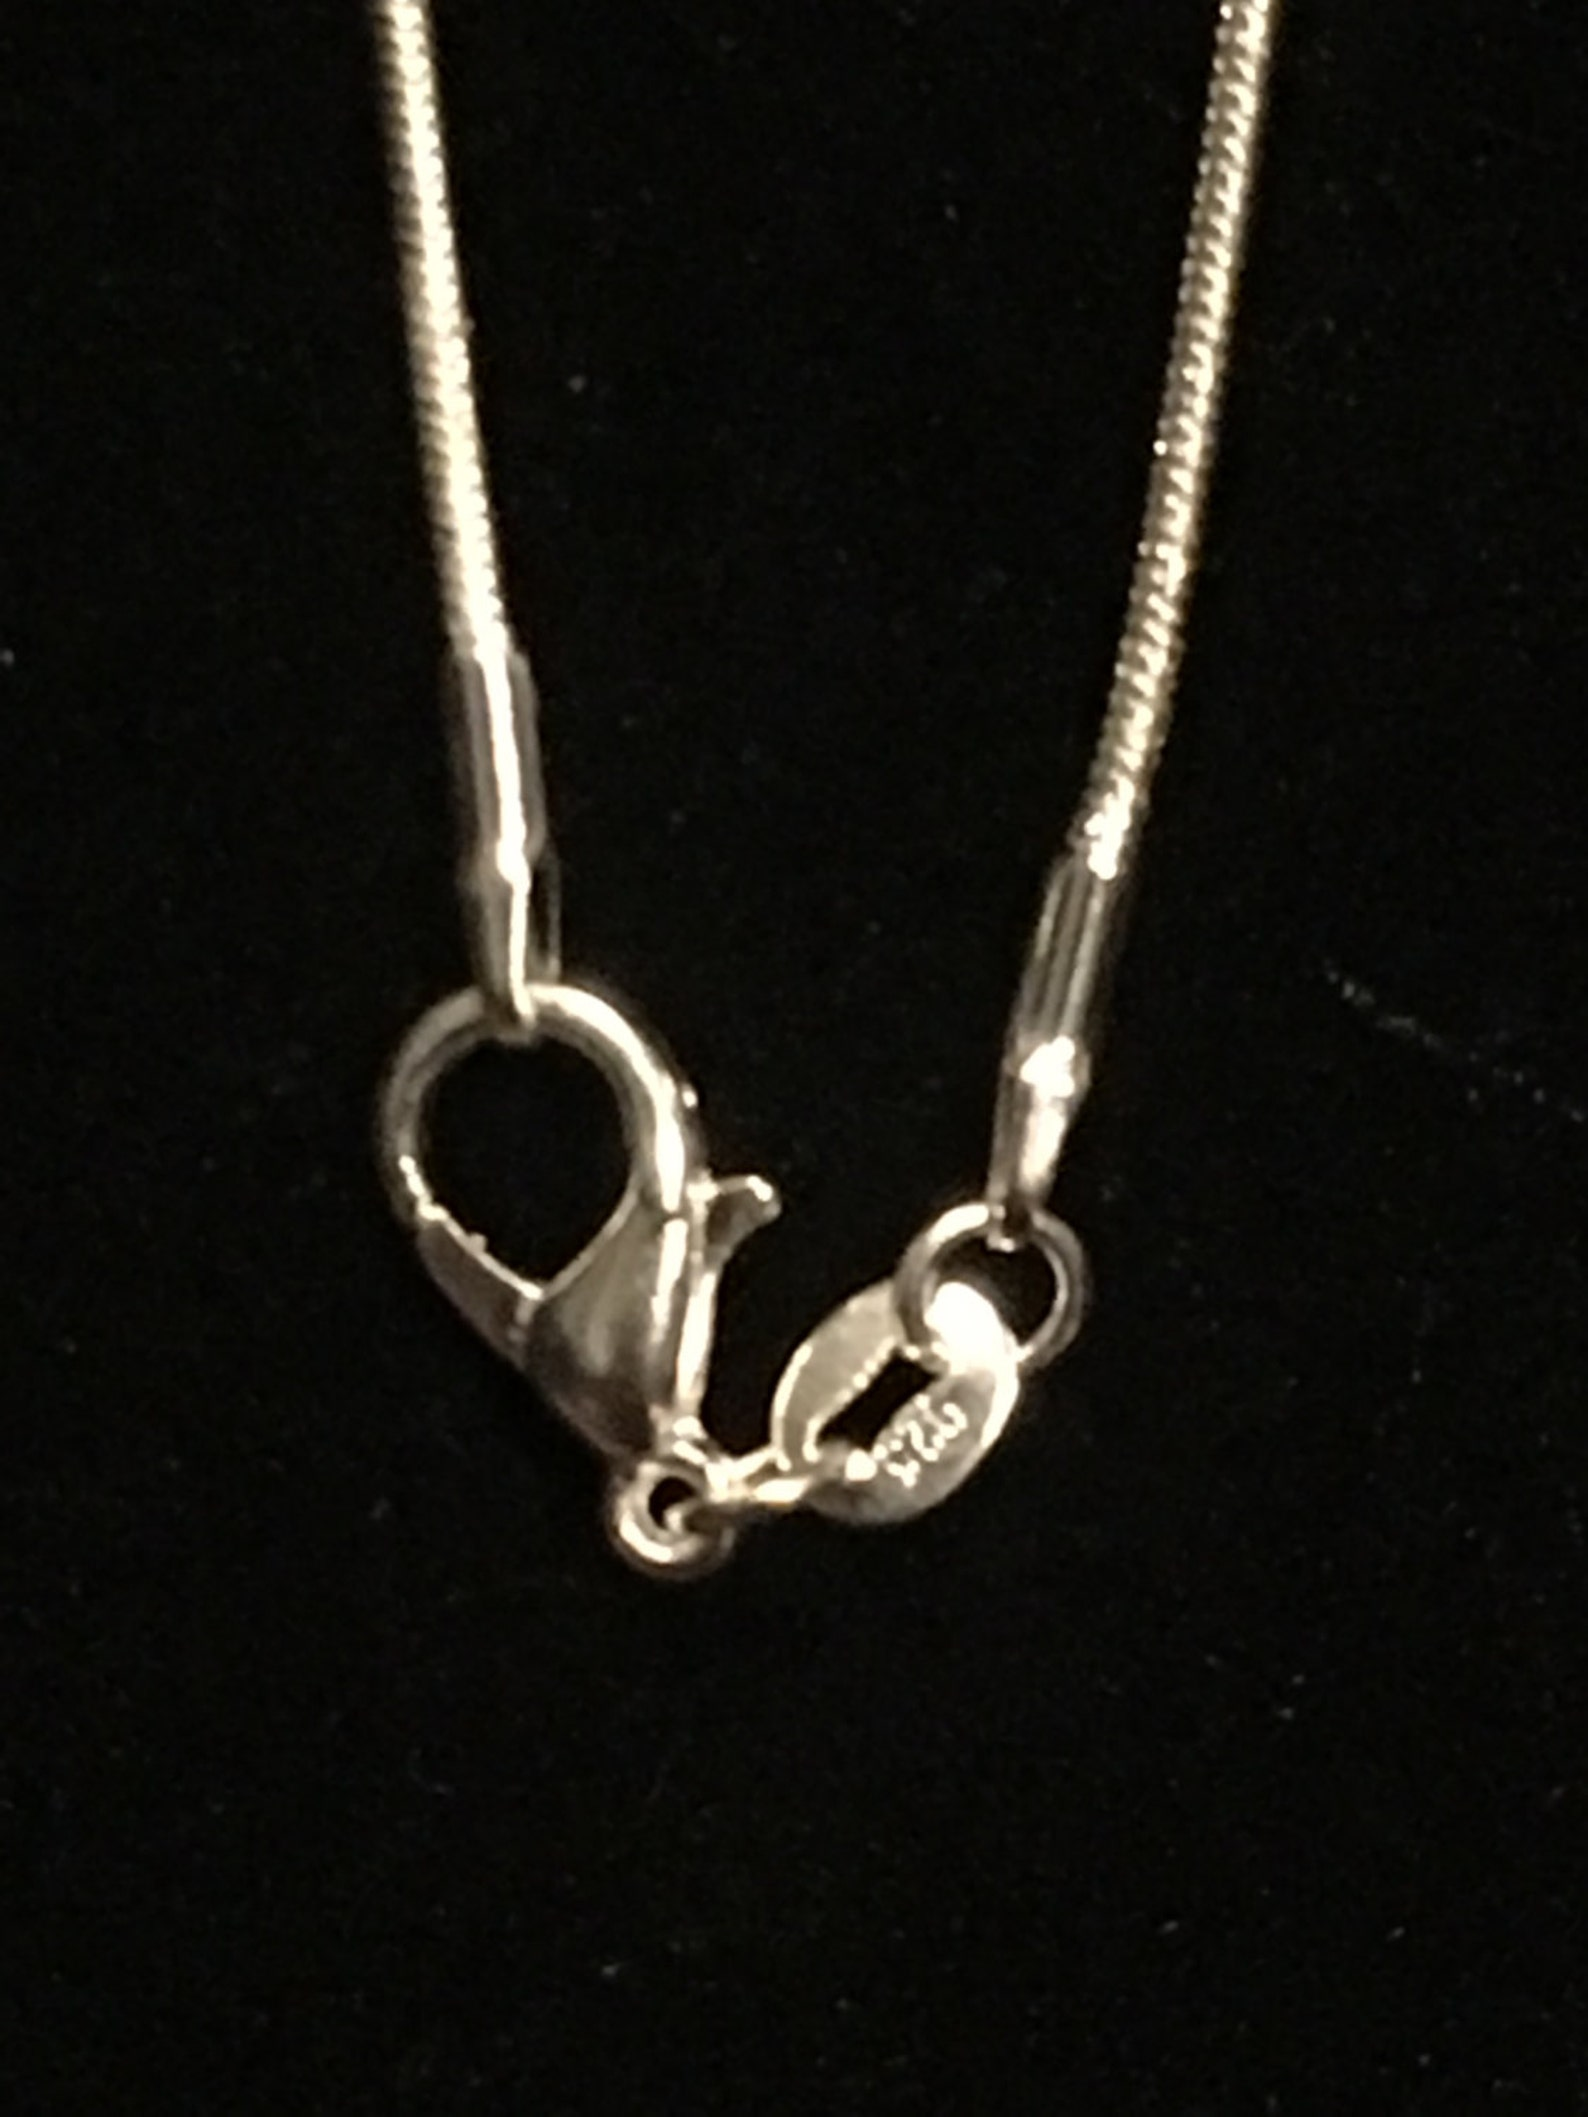 dance sterling silver necklace, ballet shoe sterling silver necklace, tap shoe sterling necklace, sterling silver necklace qb102